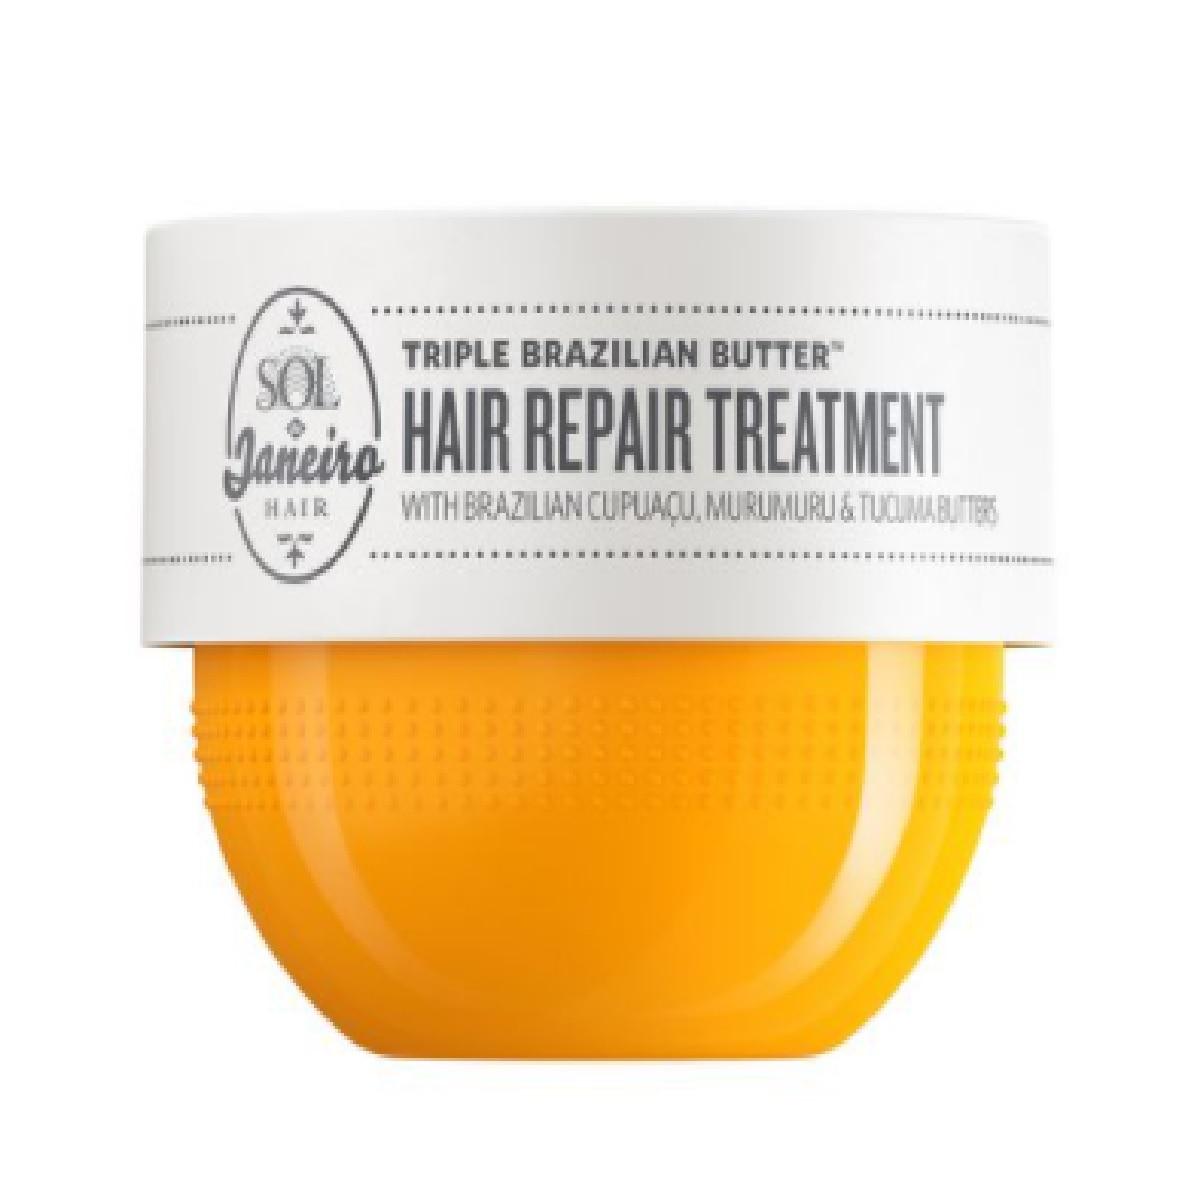 TRIPLE BRAZILIAN BUTTER™ HAIR REPAIR TREATMENT MASK (MASCARILLA PARA CABELLO)